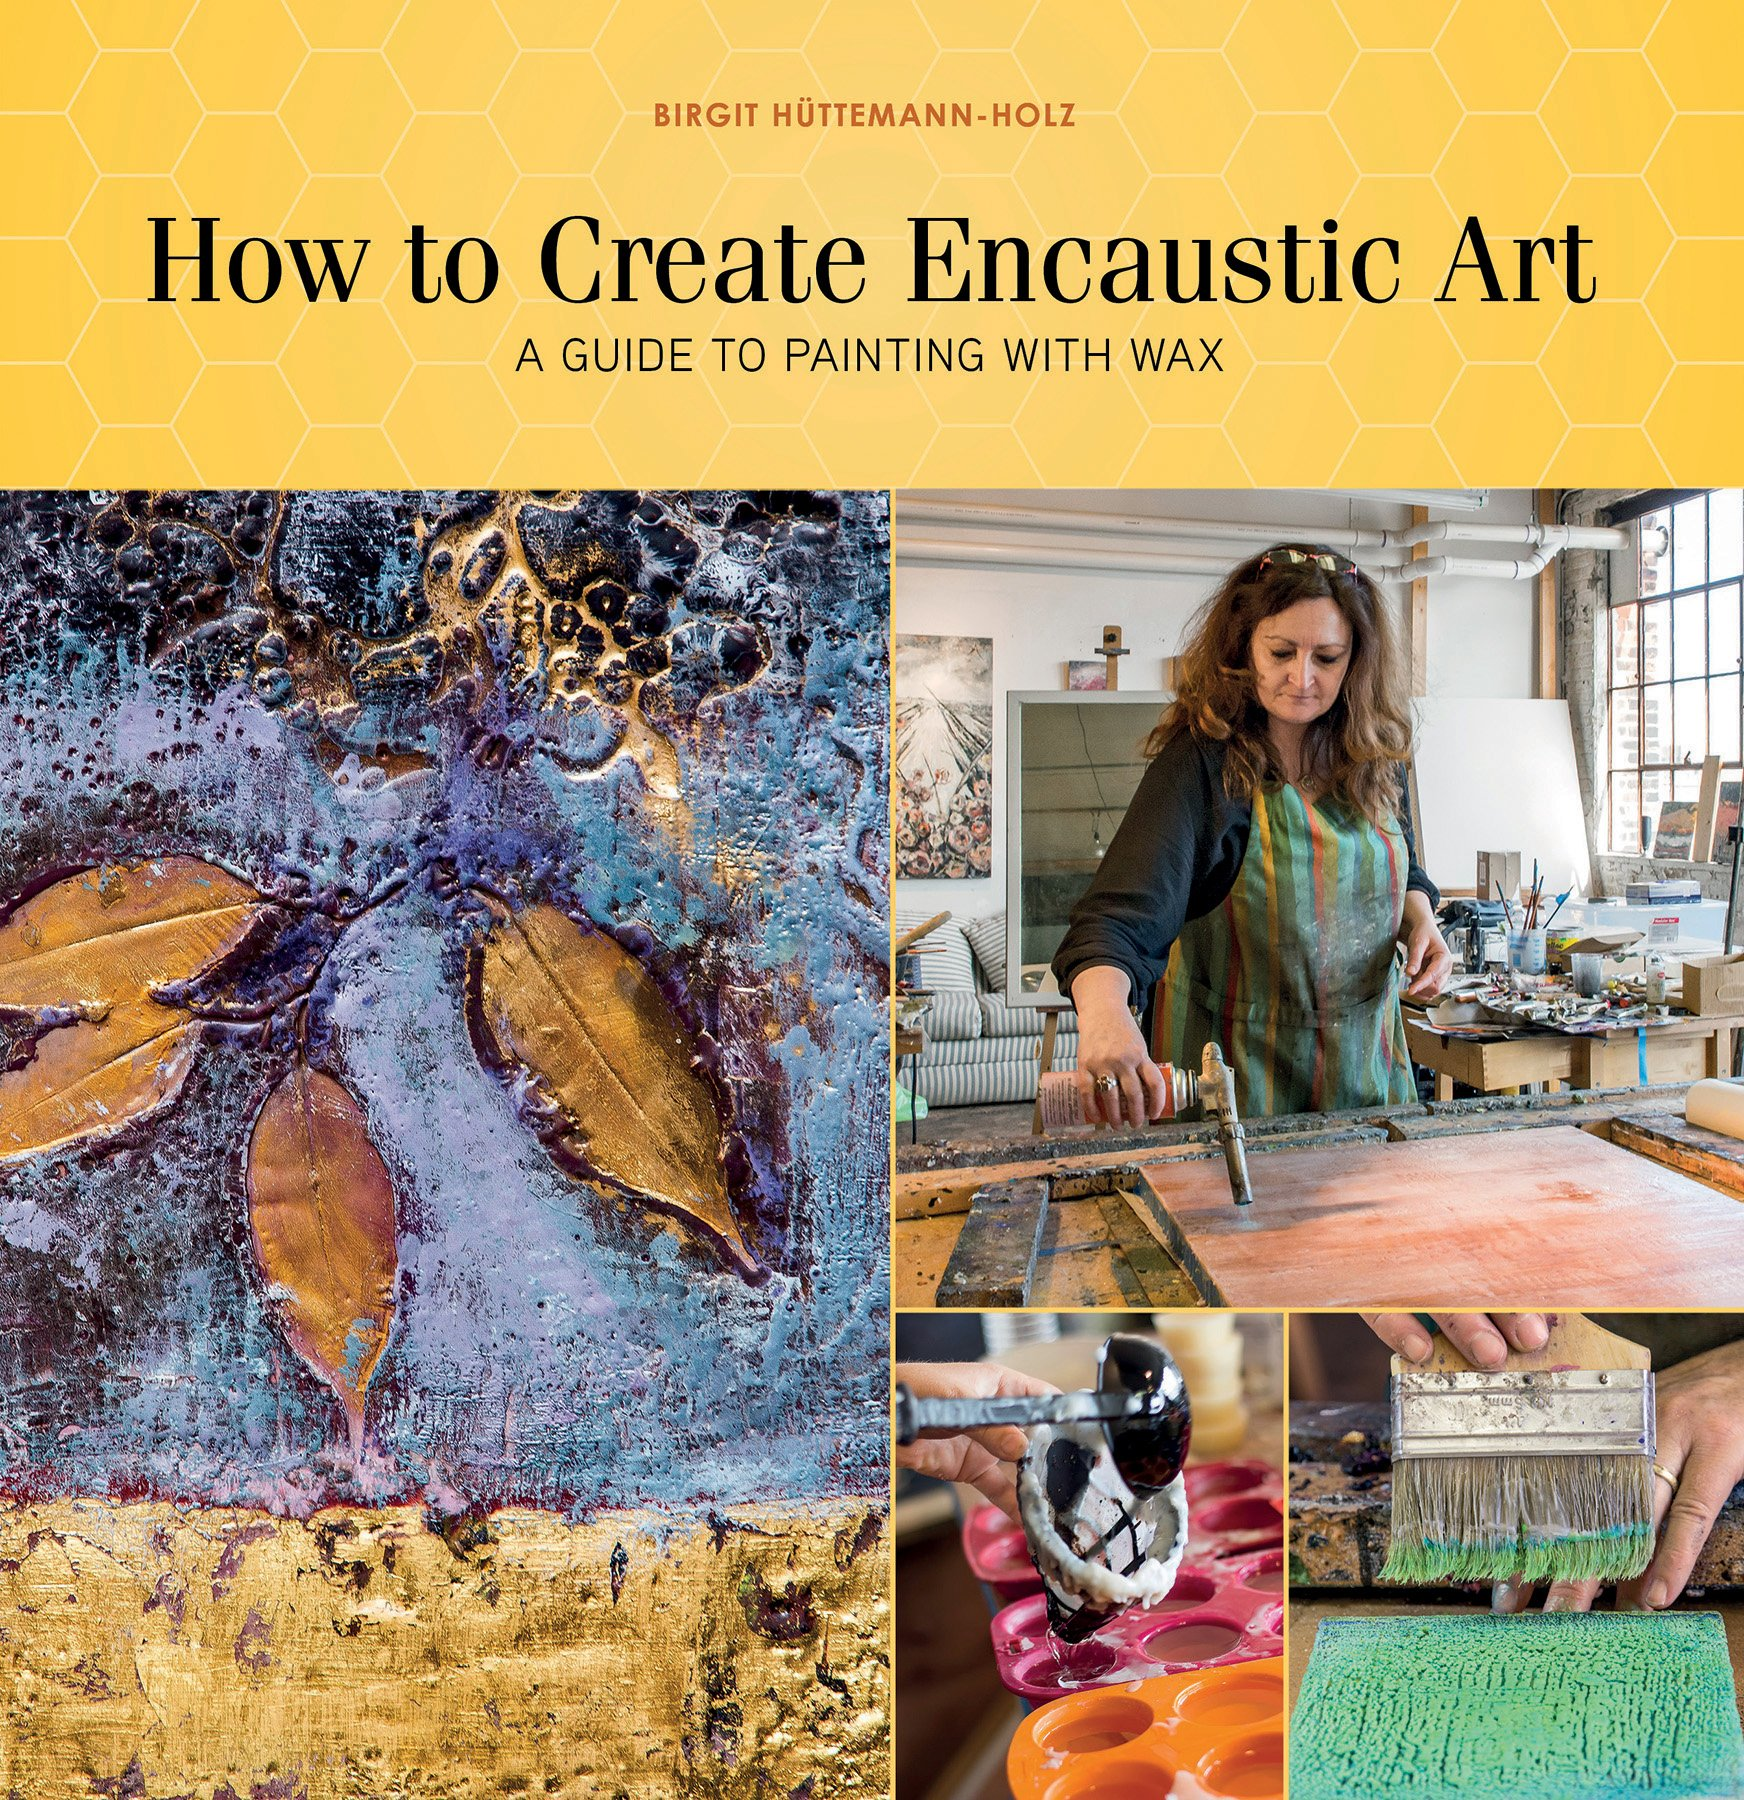 How to Create Encaustic Art book cover (by Birgit Hüttemann-Holz). #encausticart #diy #painting